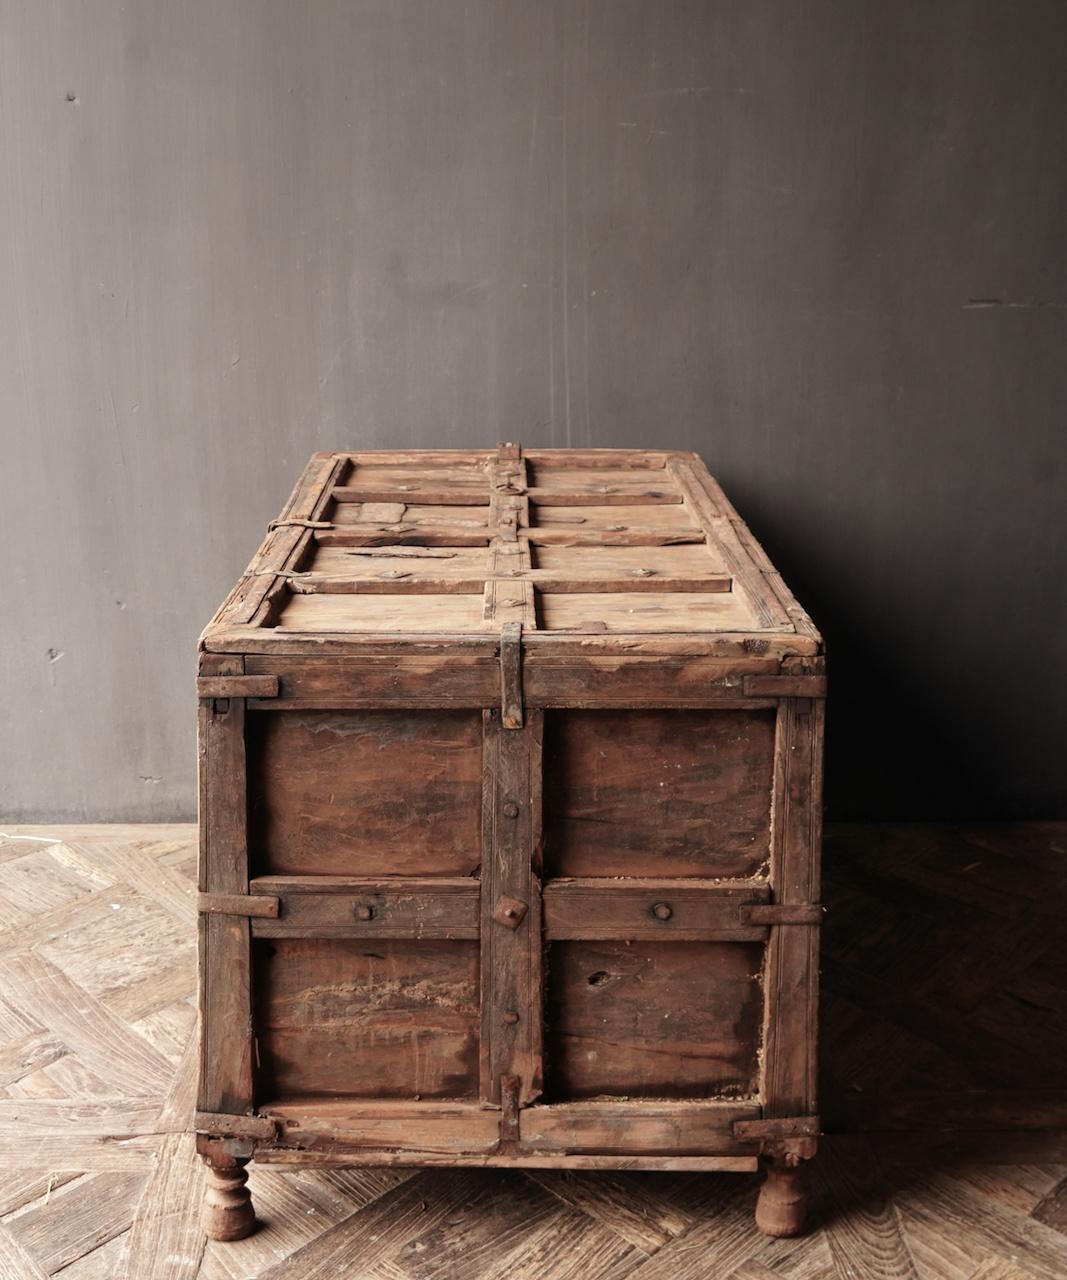 Oude Authentieke houten kist-3